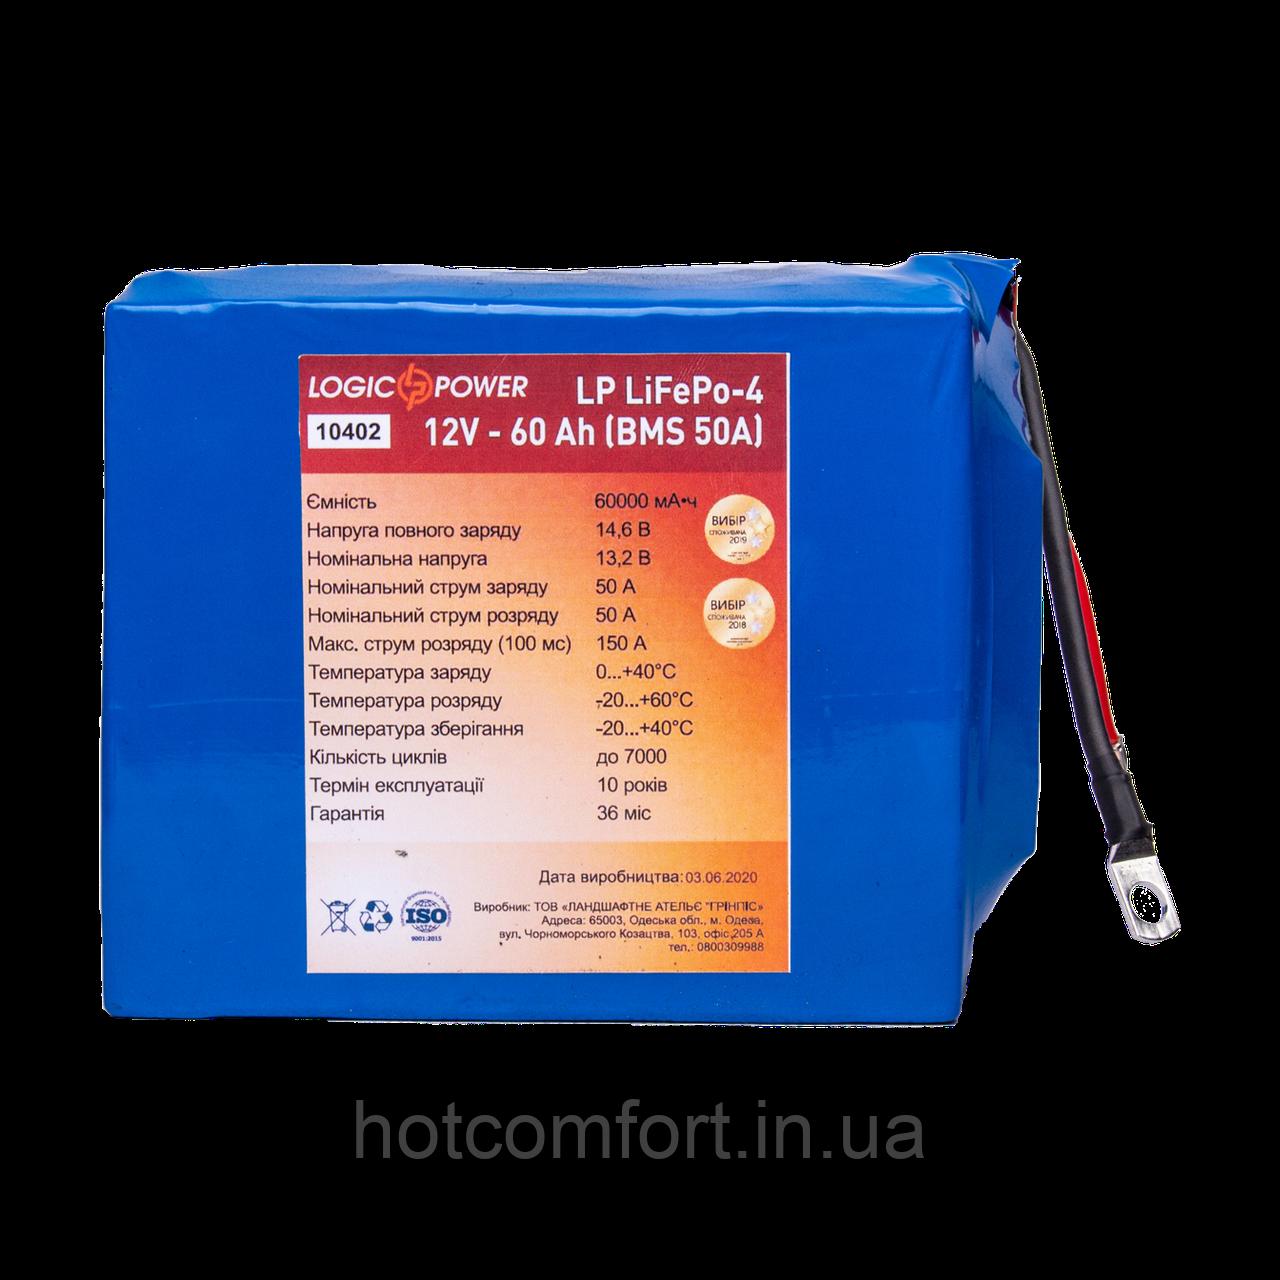 Аккумулятор LP LiFePo-4 12V - 60 Ah (BMS 50A)